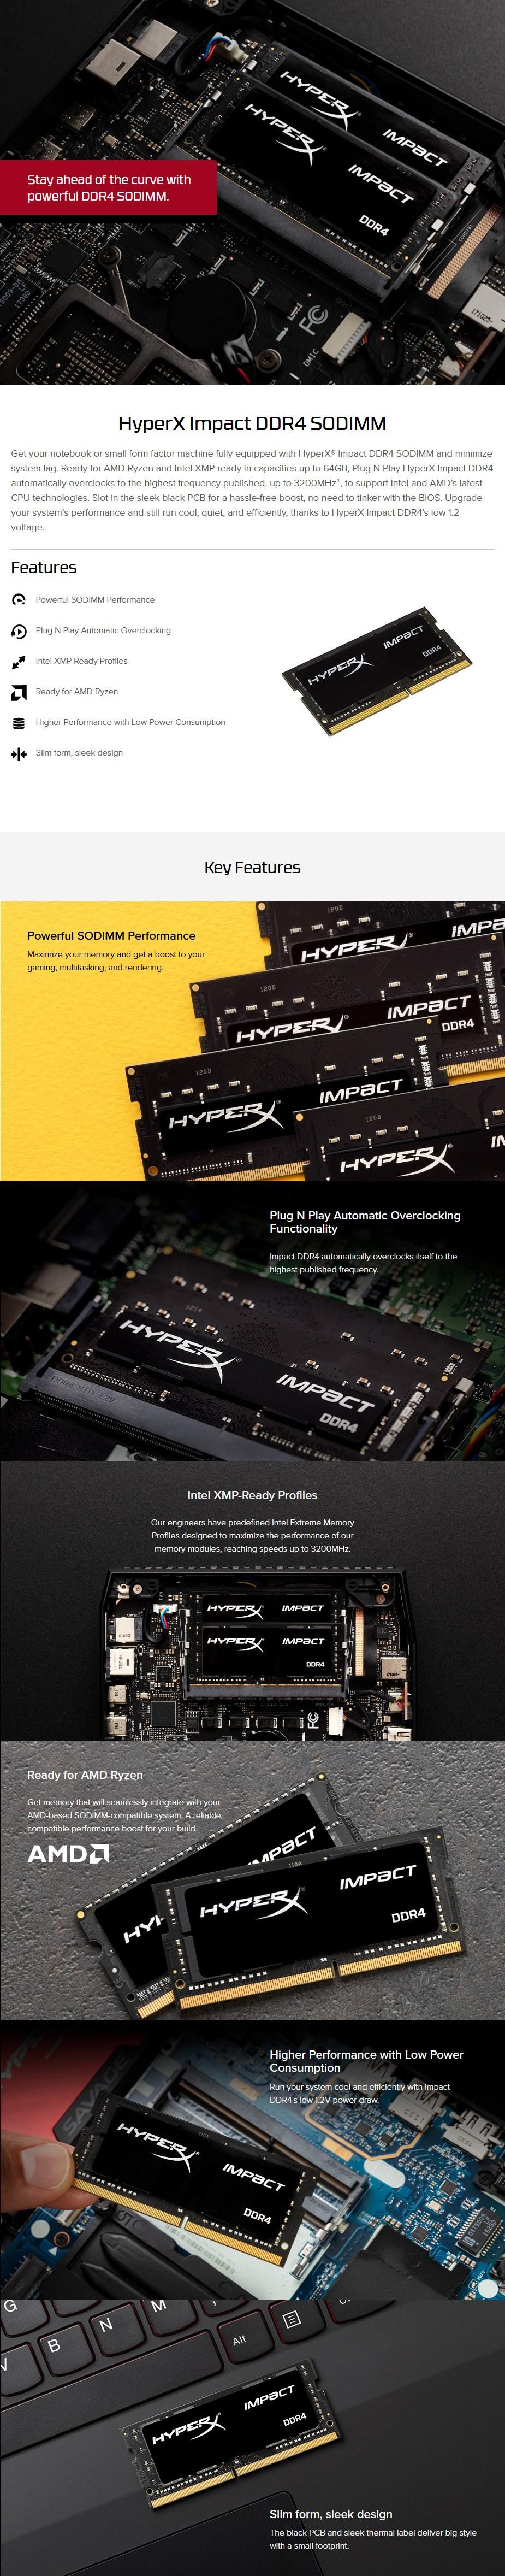 kingston-hyperx-impact-16gb-2x-8gb-ddr4-2666mhz-notebook-memory-ac38662-4-7-.jpg